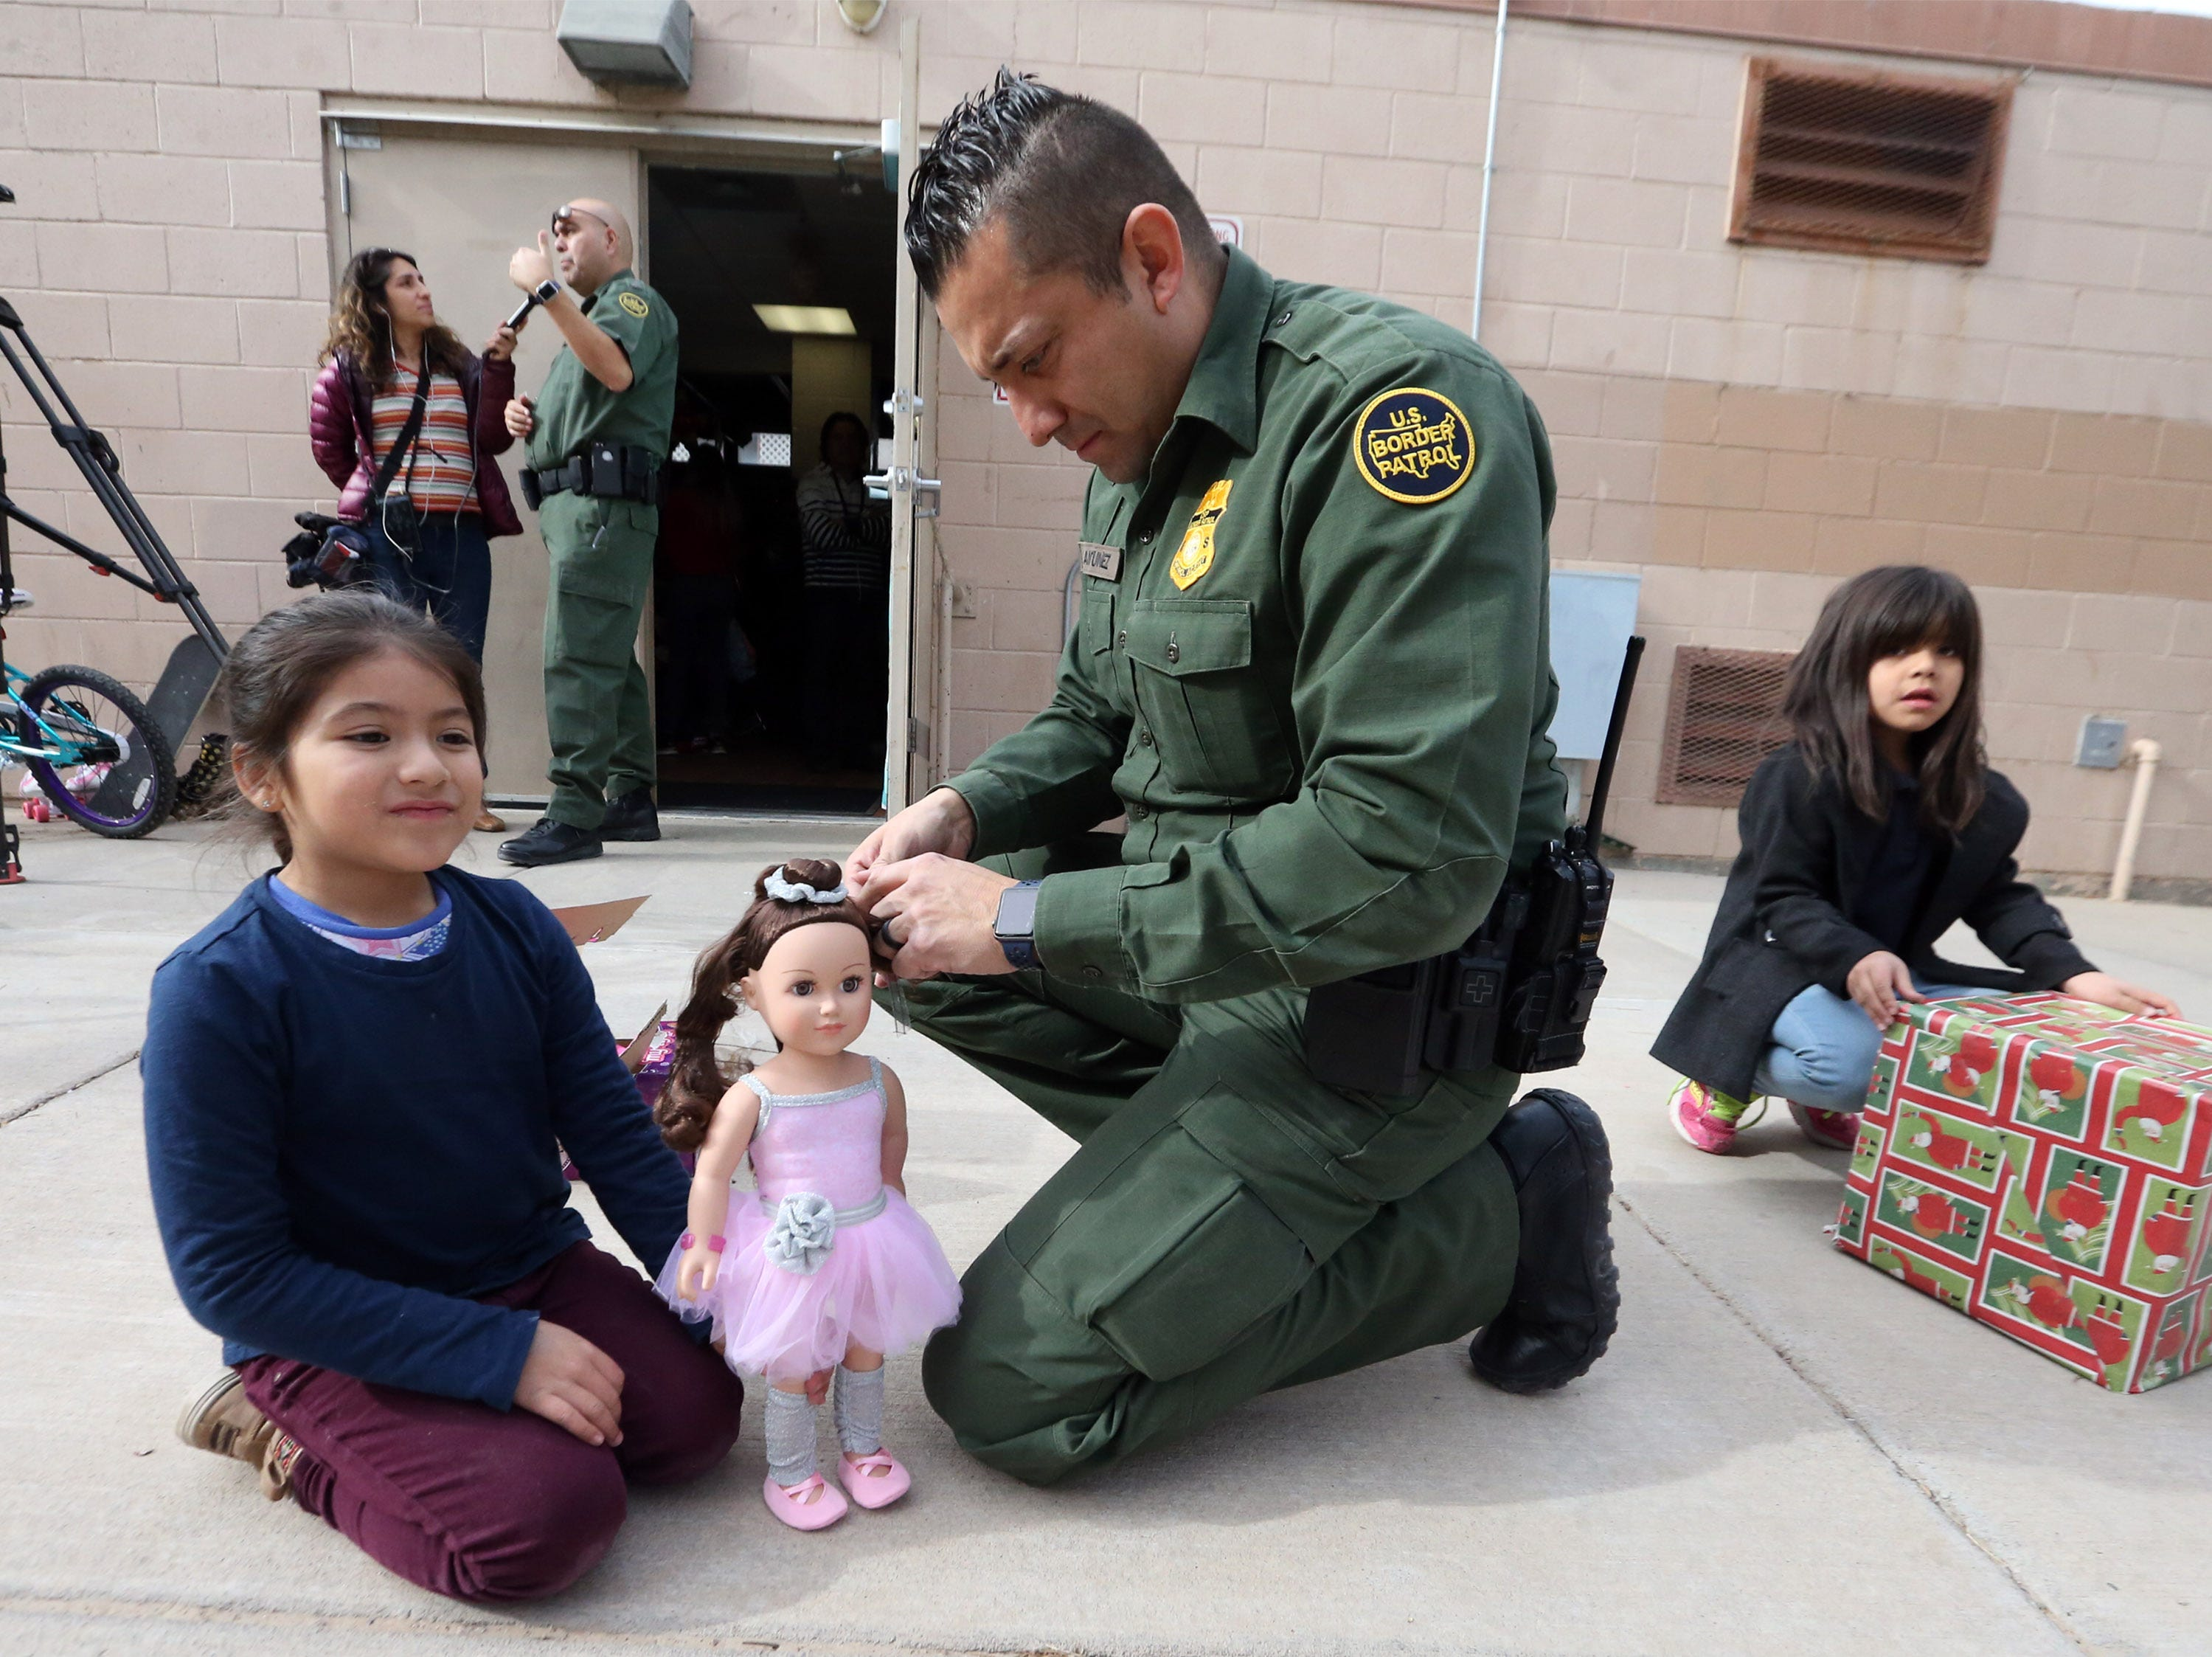 U.S. Border Patrol agent Carlos Antunez helps Ximena Cibrian unwrap her gift outside the Chihuahuita Community Center Friday.